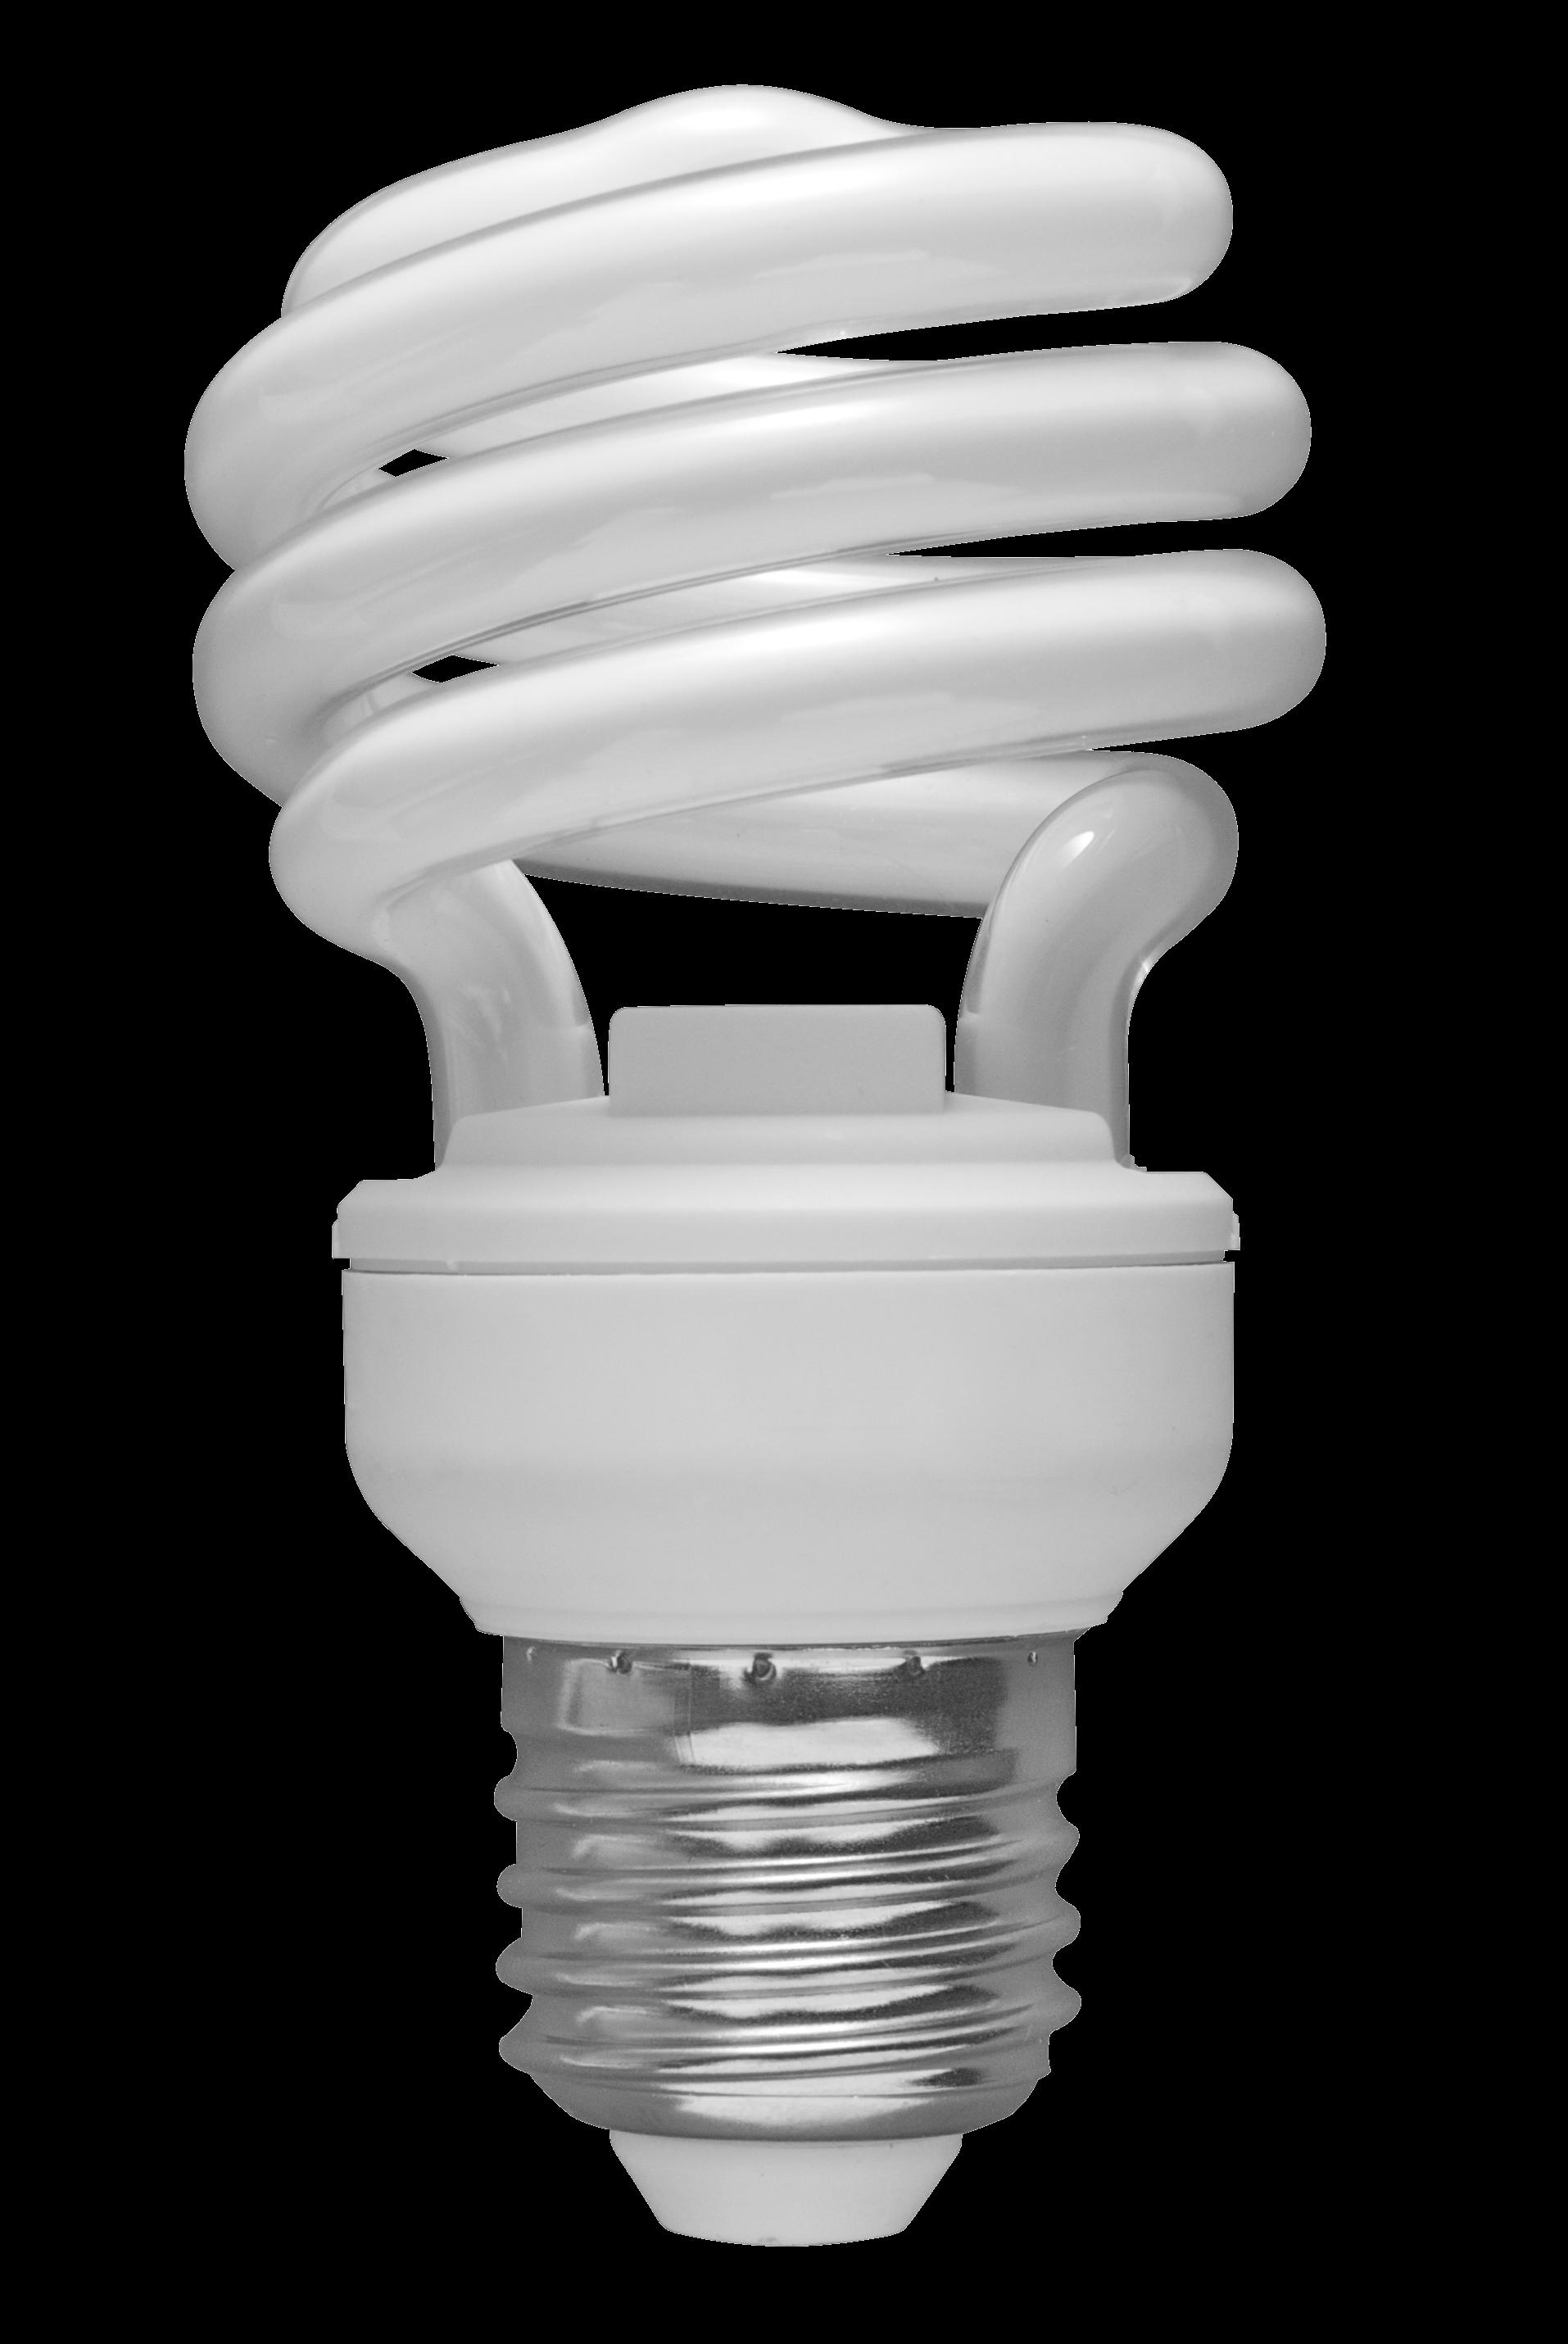 white day light bulb PNG image - Light Bulb PNG